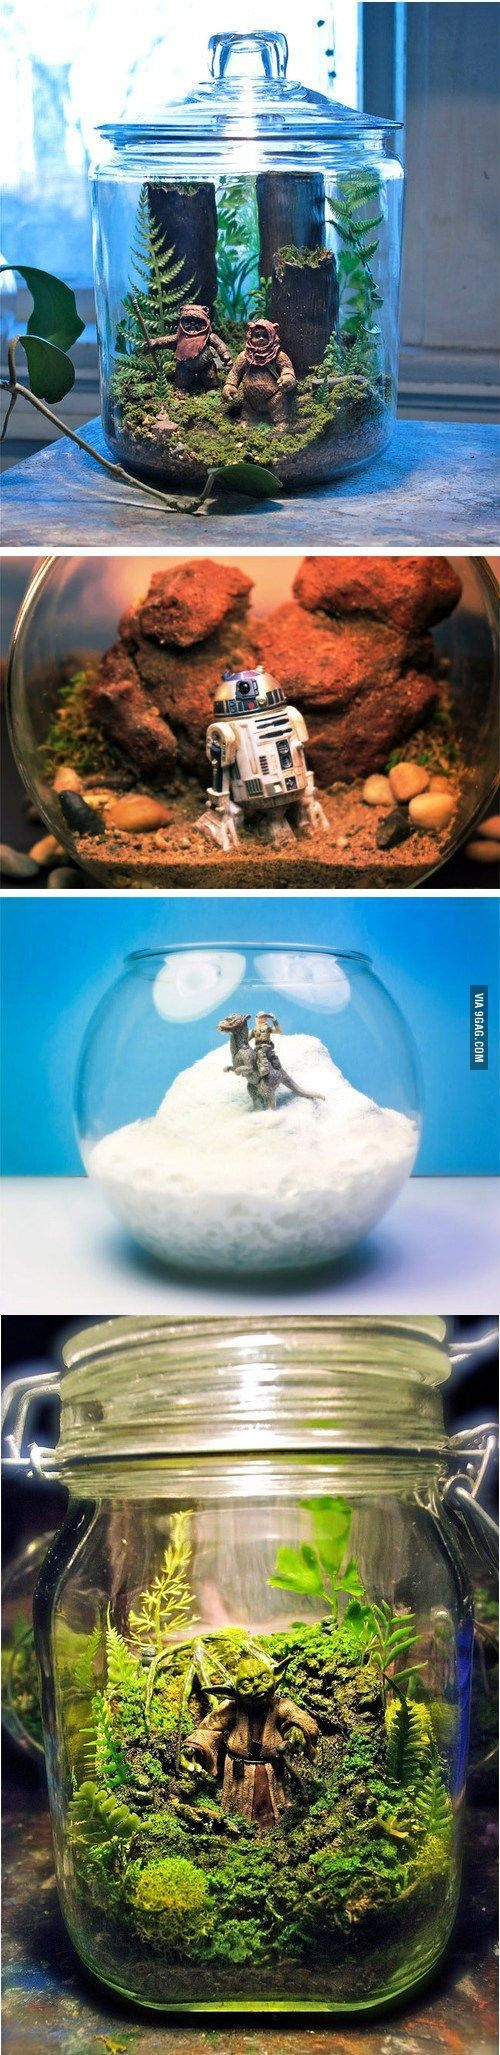 My next DIY project: Star Wars terrariums.